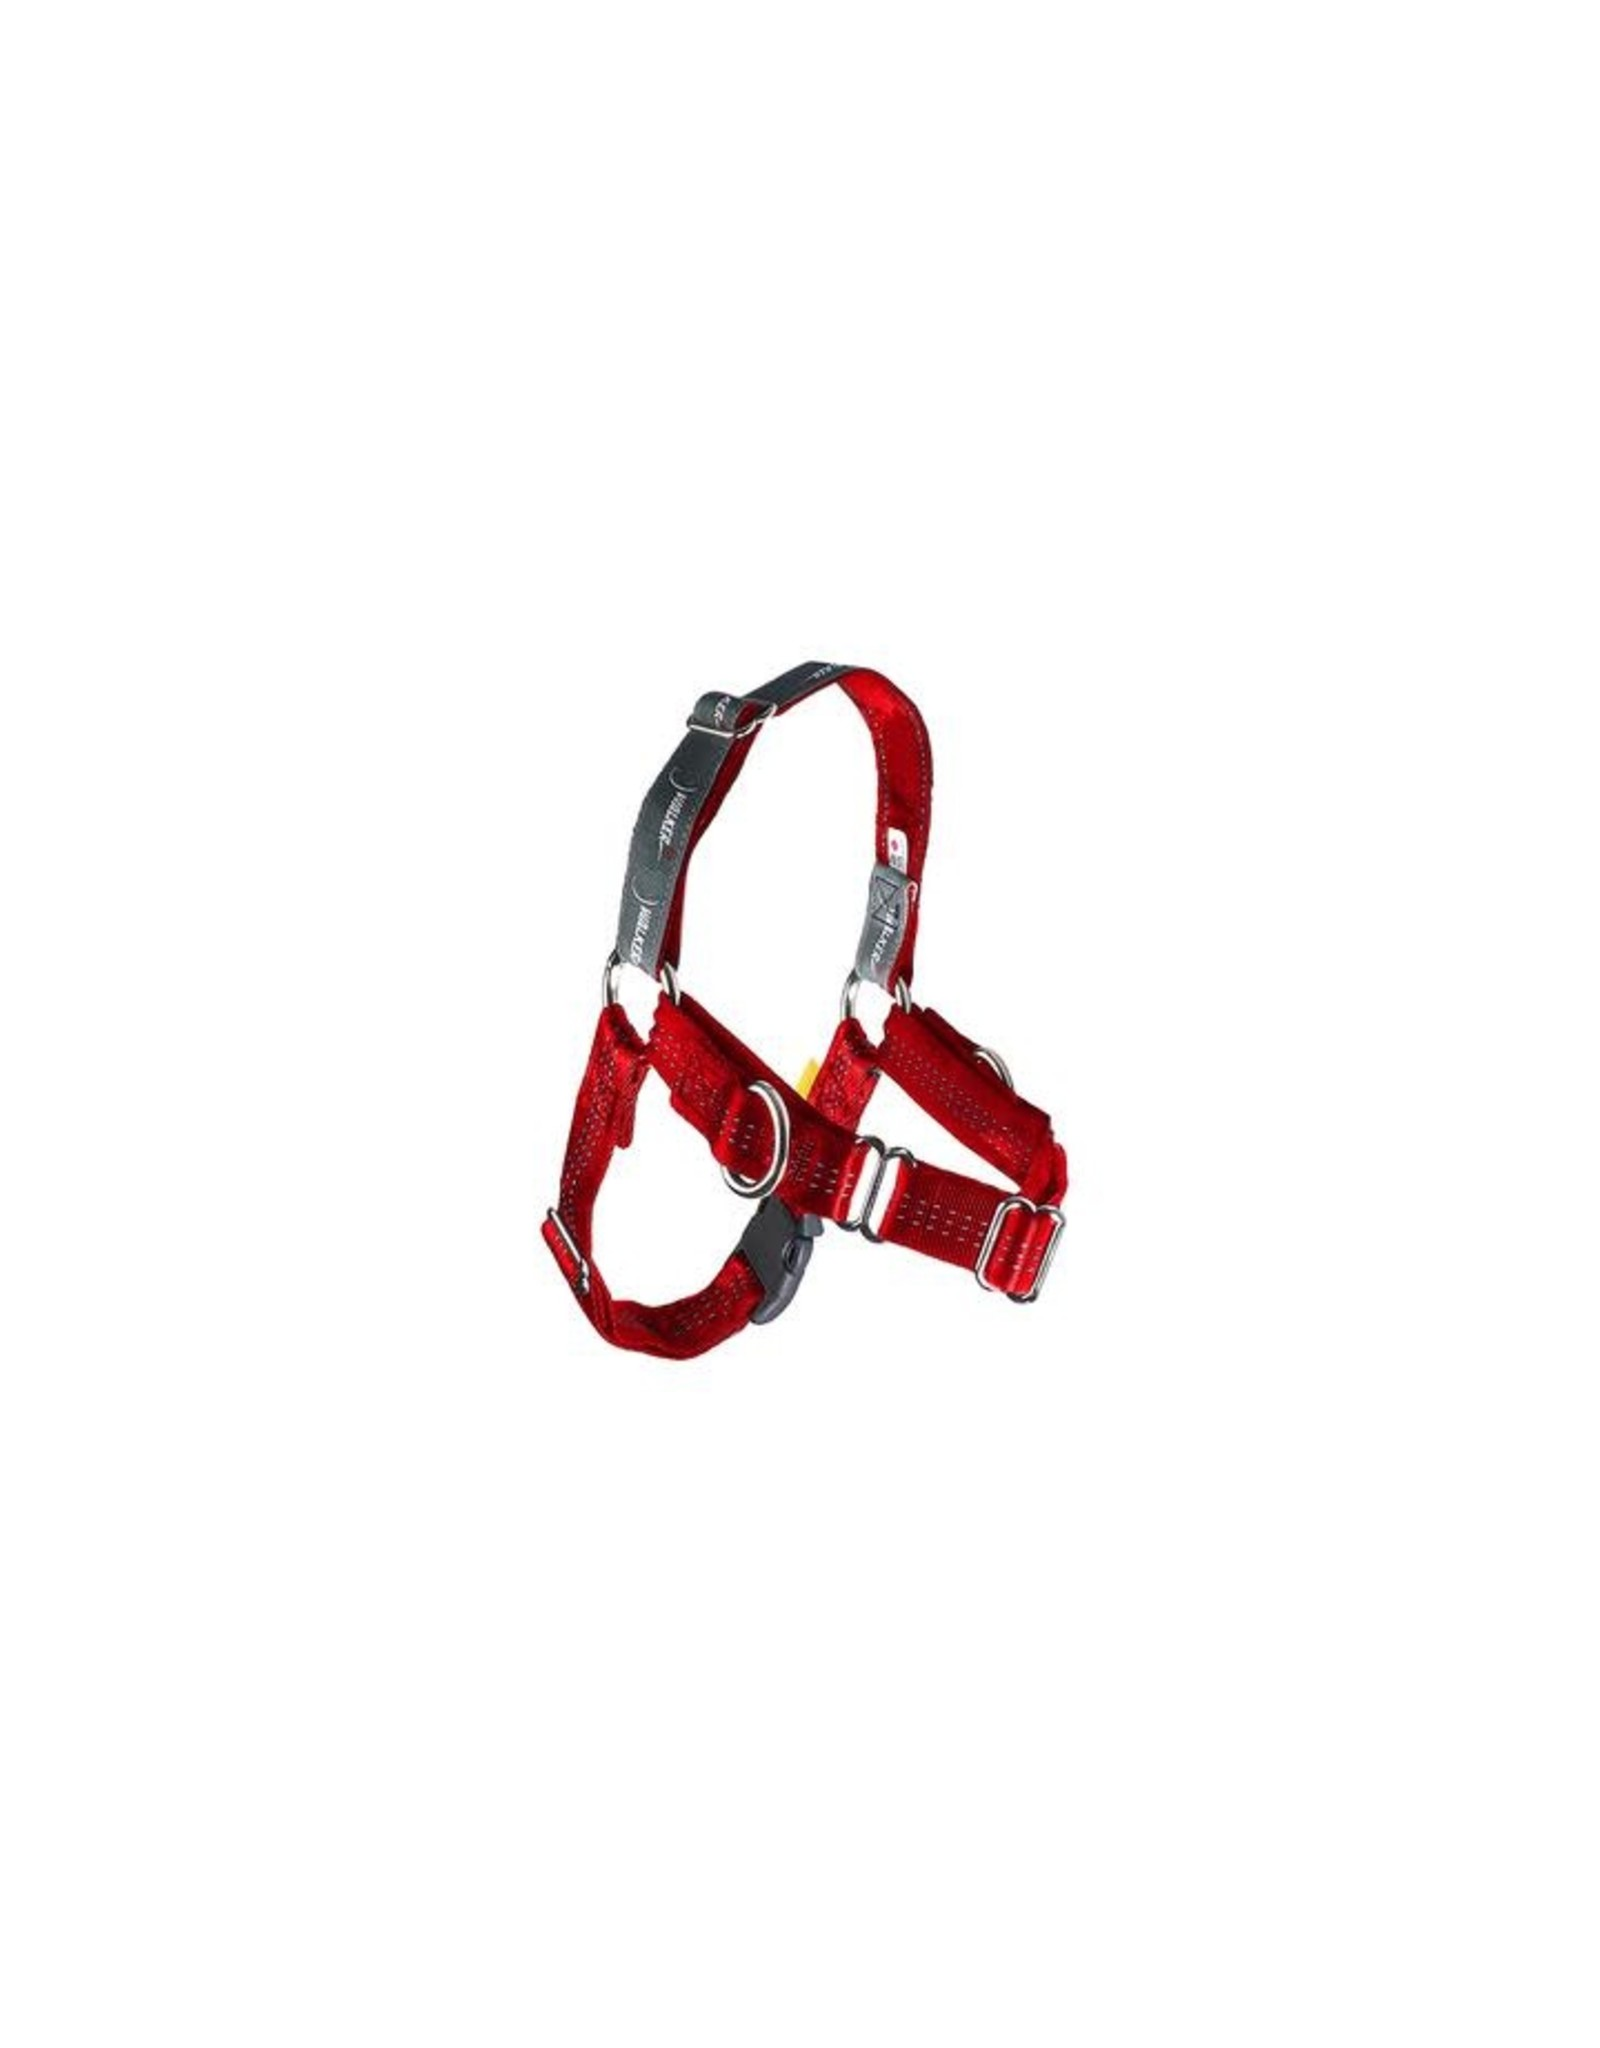 JWalker JWalker Harness - Red - M/L